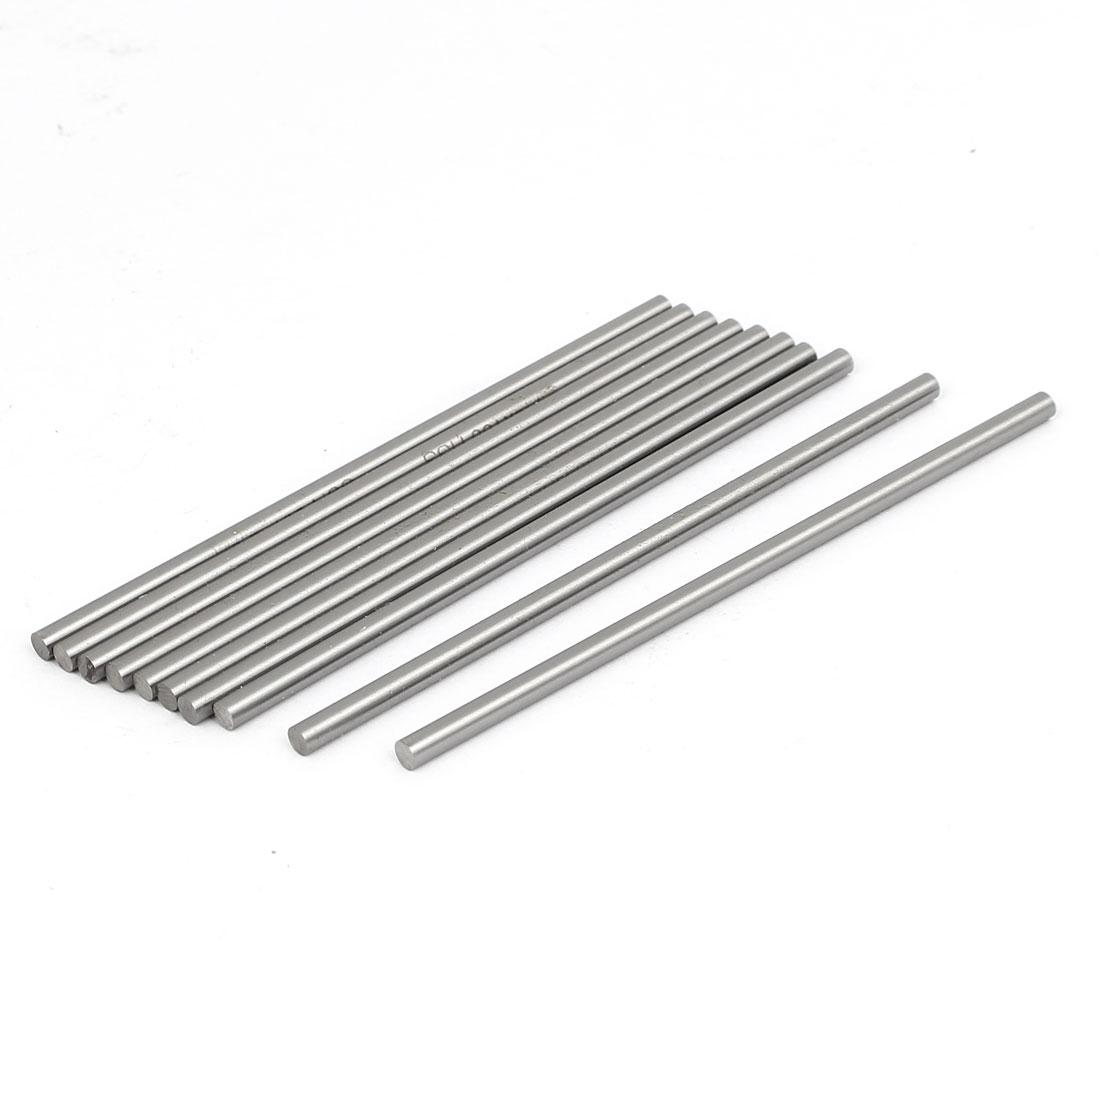 3.5mm Dia 100mm Length HSS Round Shaft Rod Bar Lathe Tools Gray 10pcs